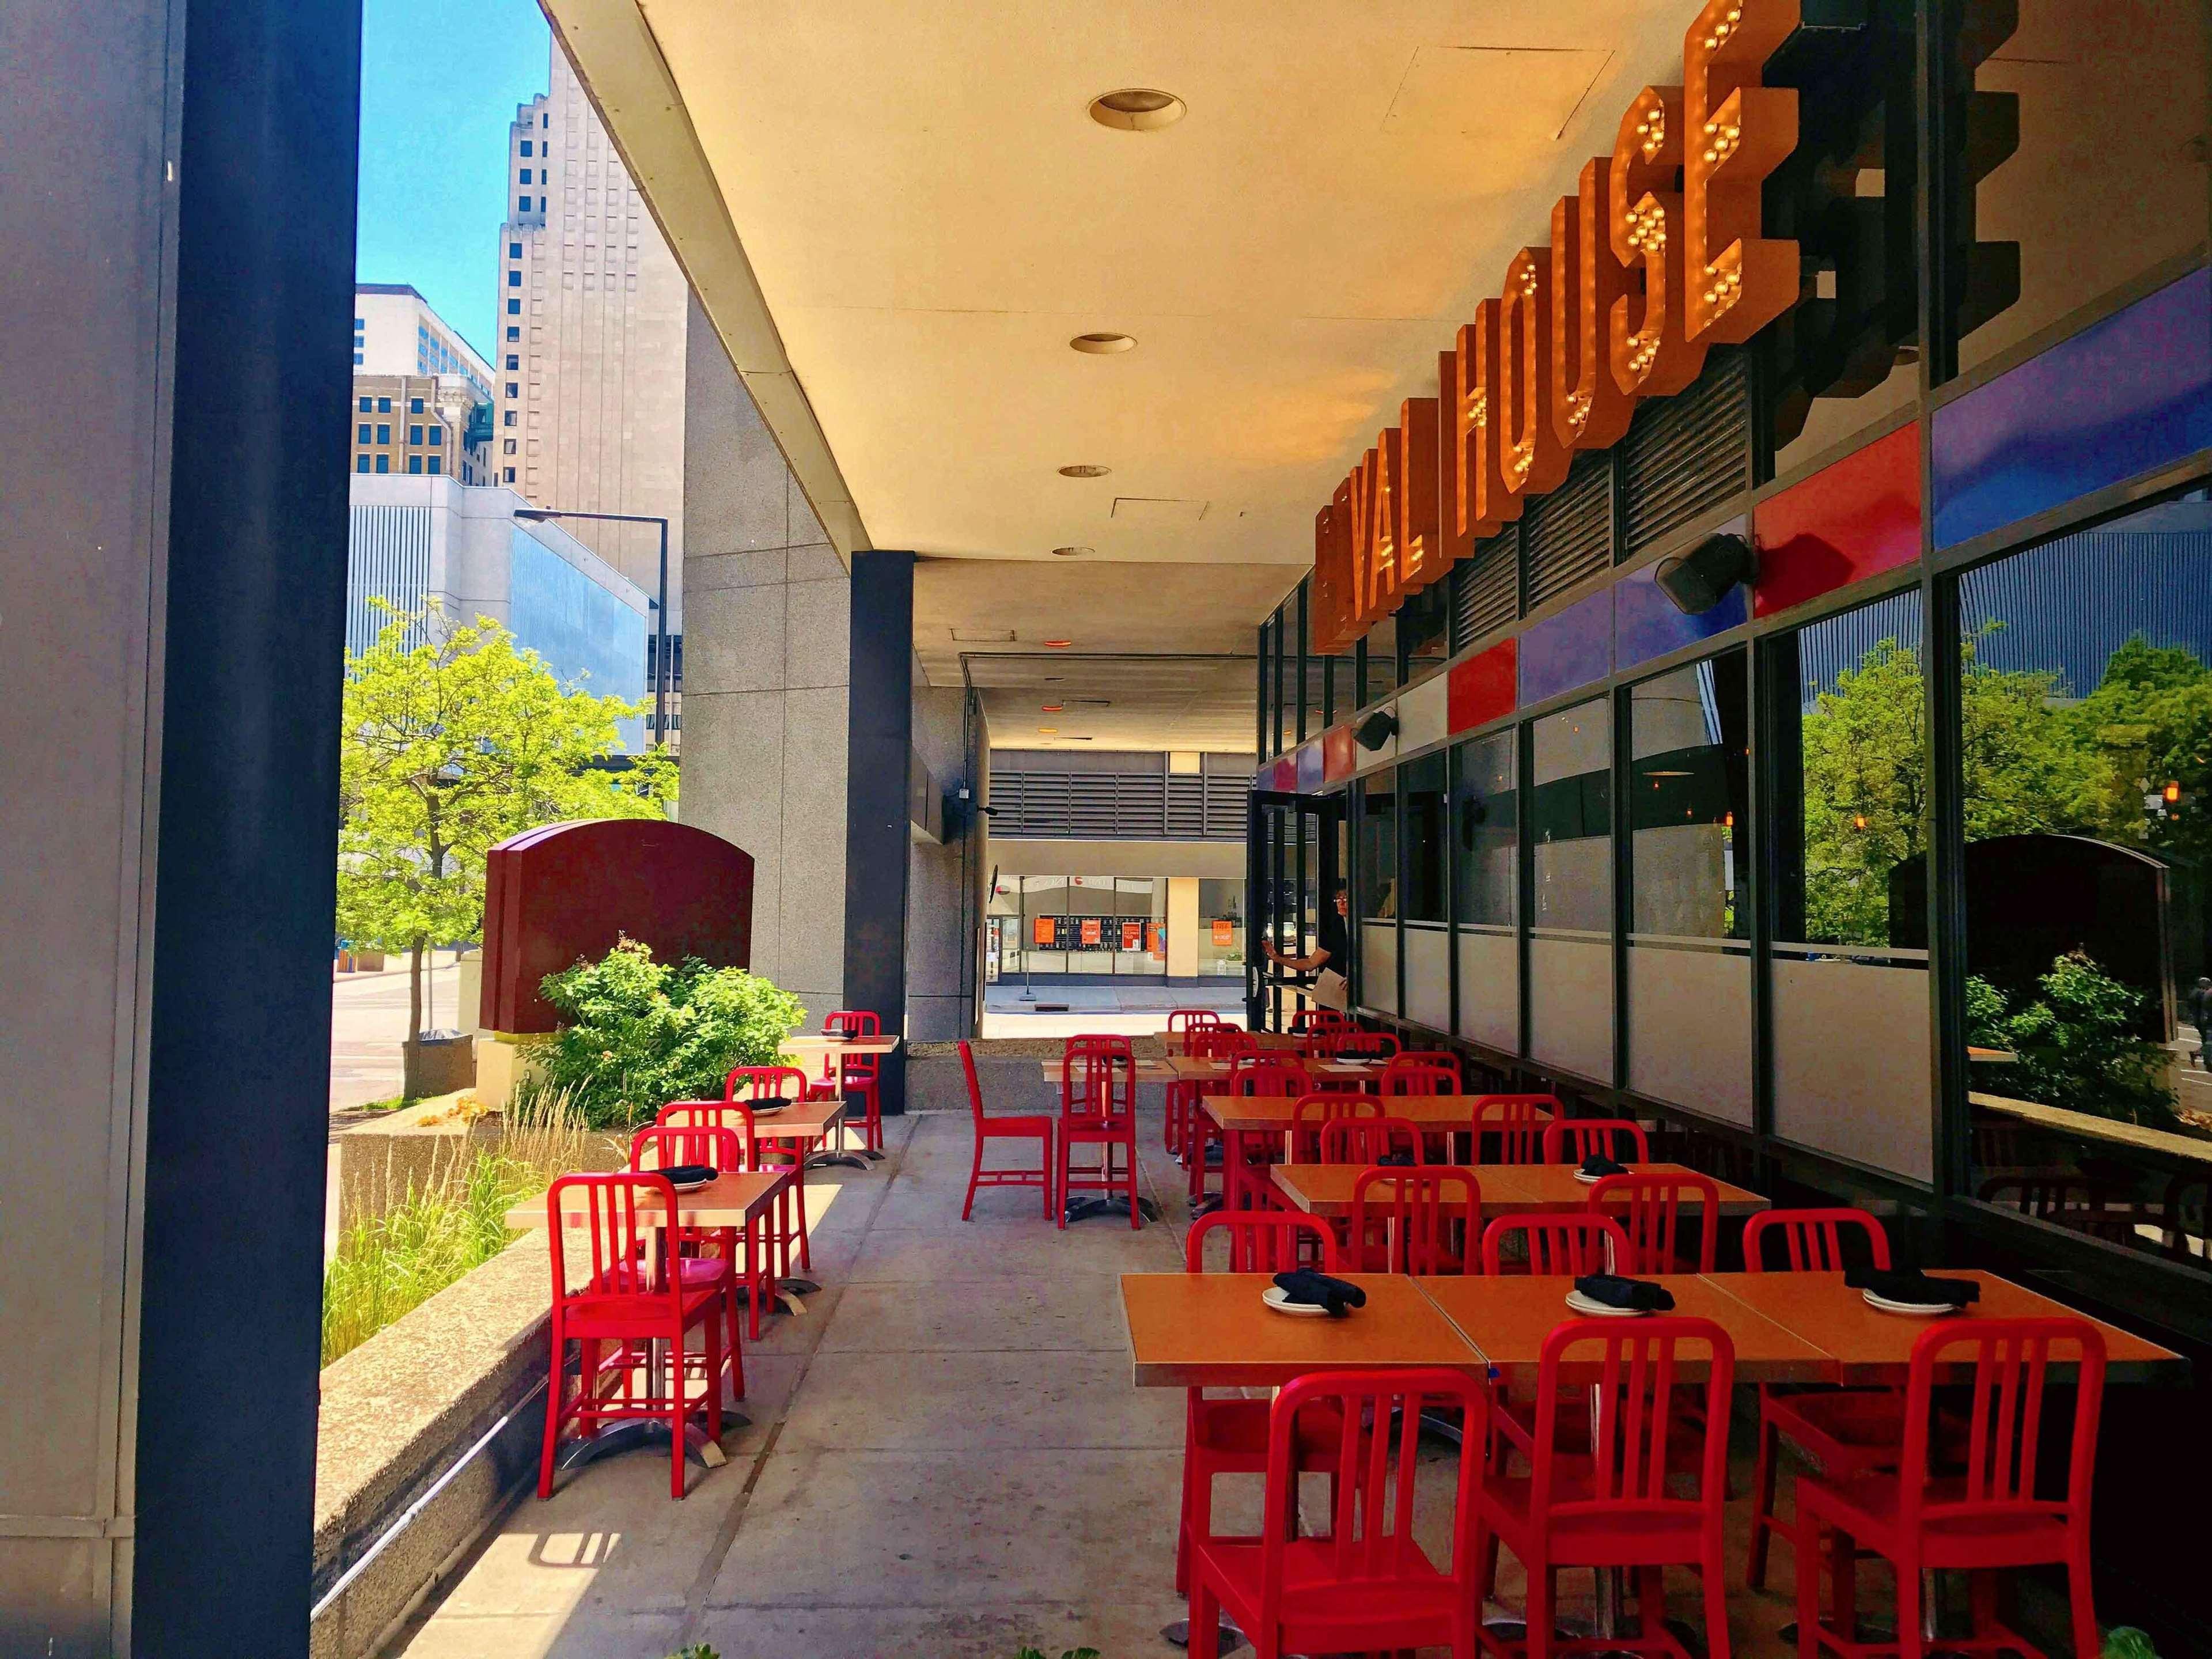 Keys Cafe Downtown St Paul Mn